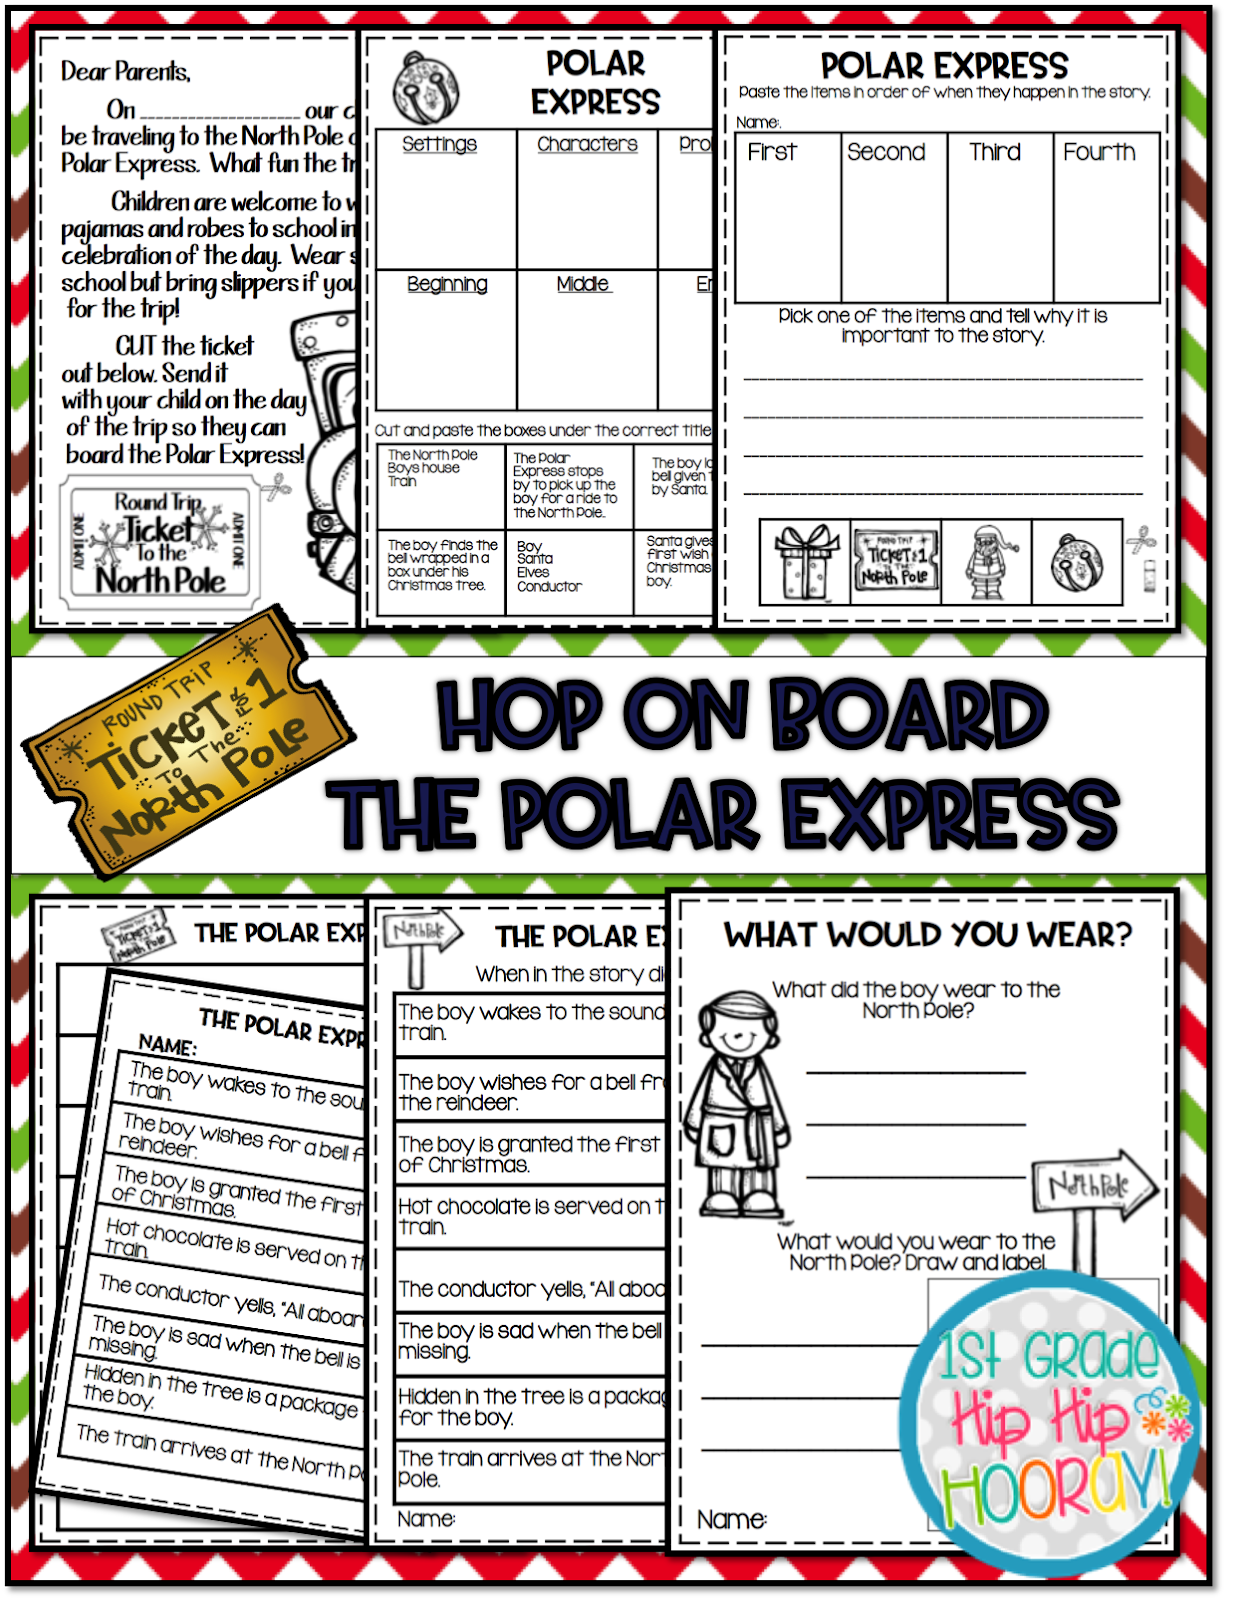 1st Grade Hip Hip Hooray Polar Express